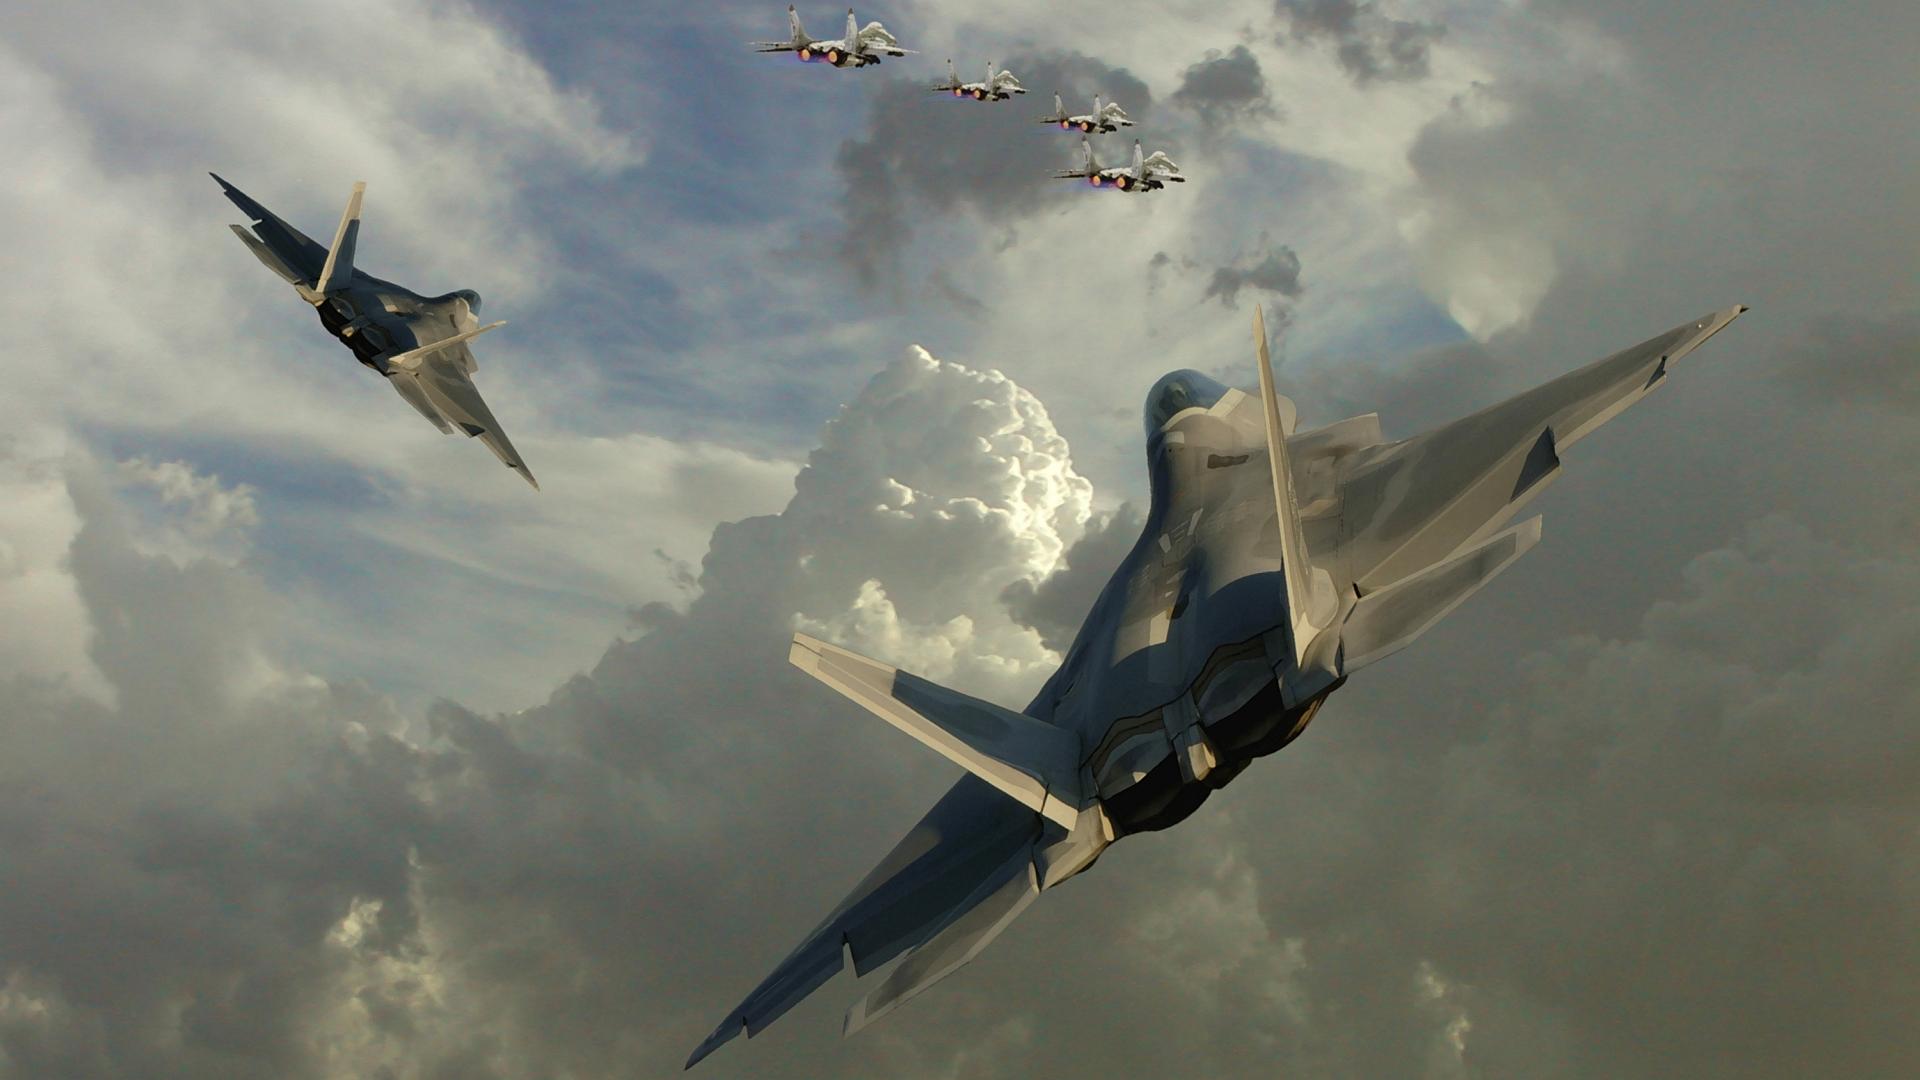 73 Fighter Jet Desktop Backgrounds On Wallpapersafari